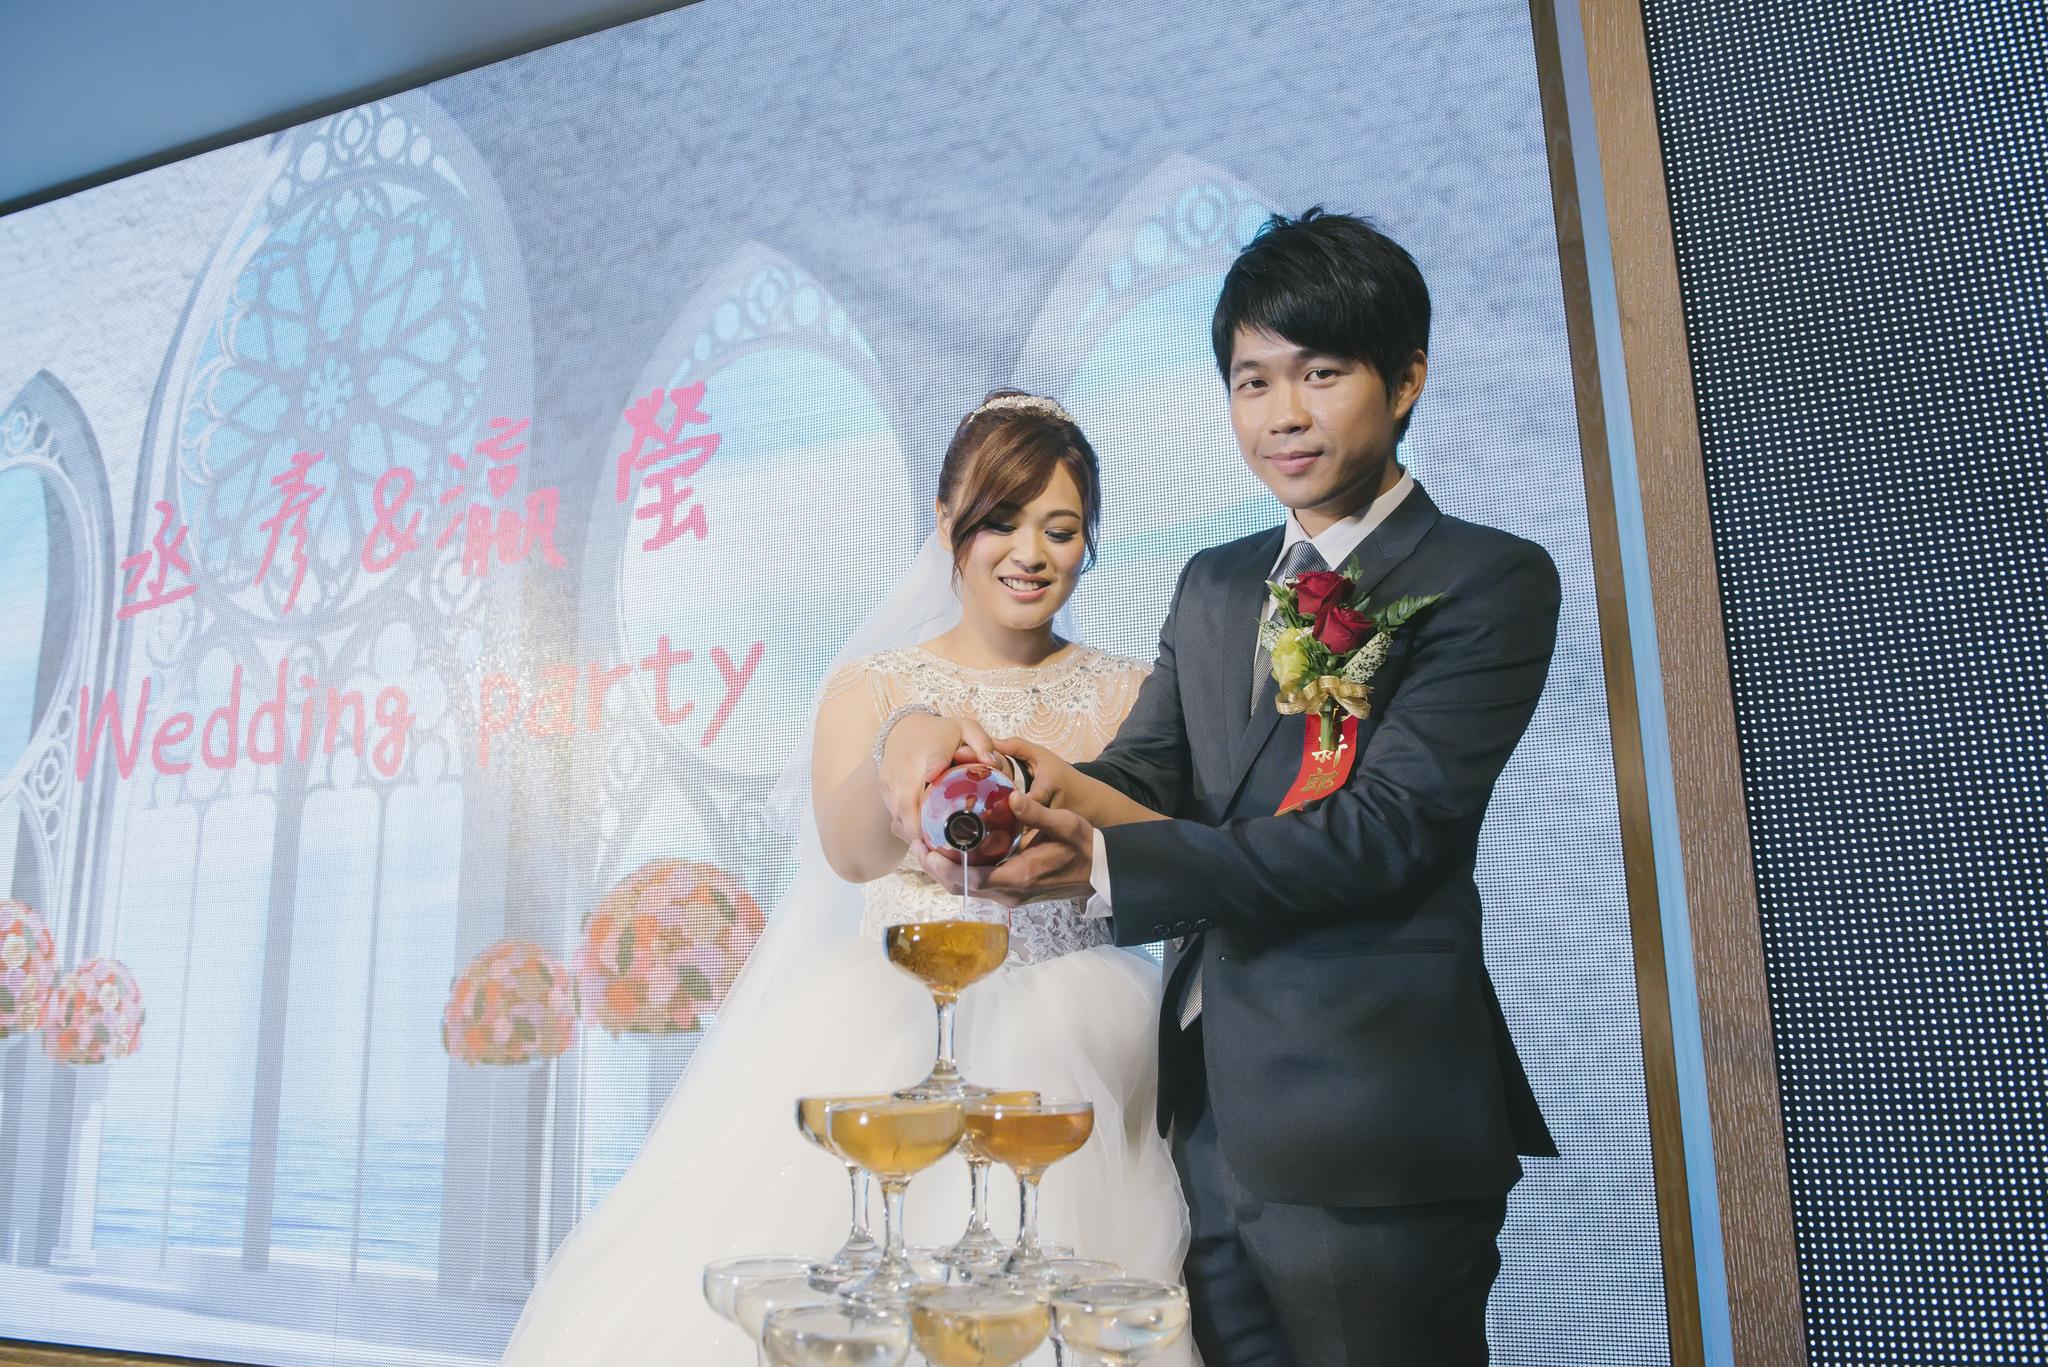 28629712130 846b1f0067 k - 【婚禮記錄】丞彥&瀛瑩 台北